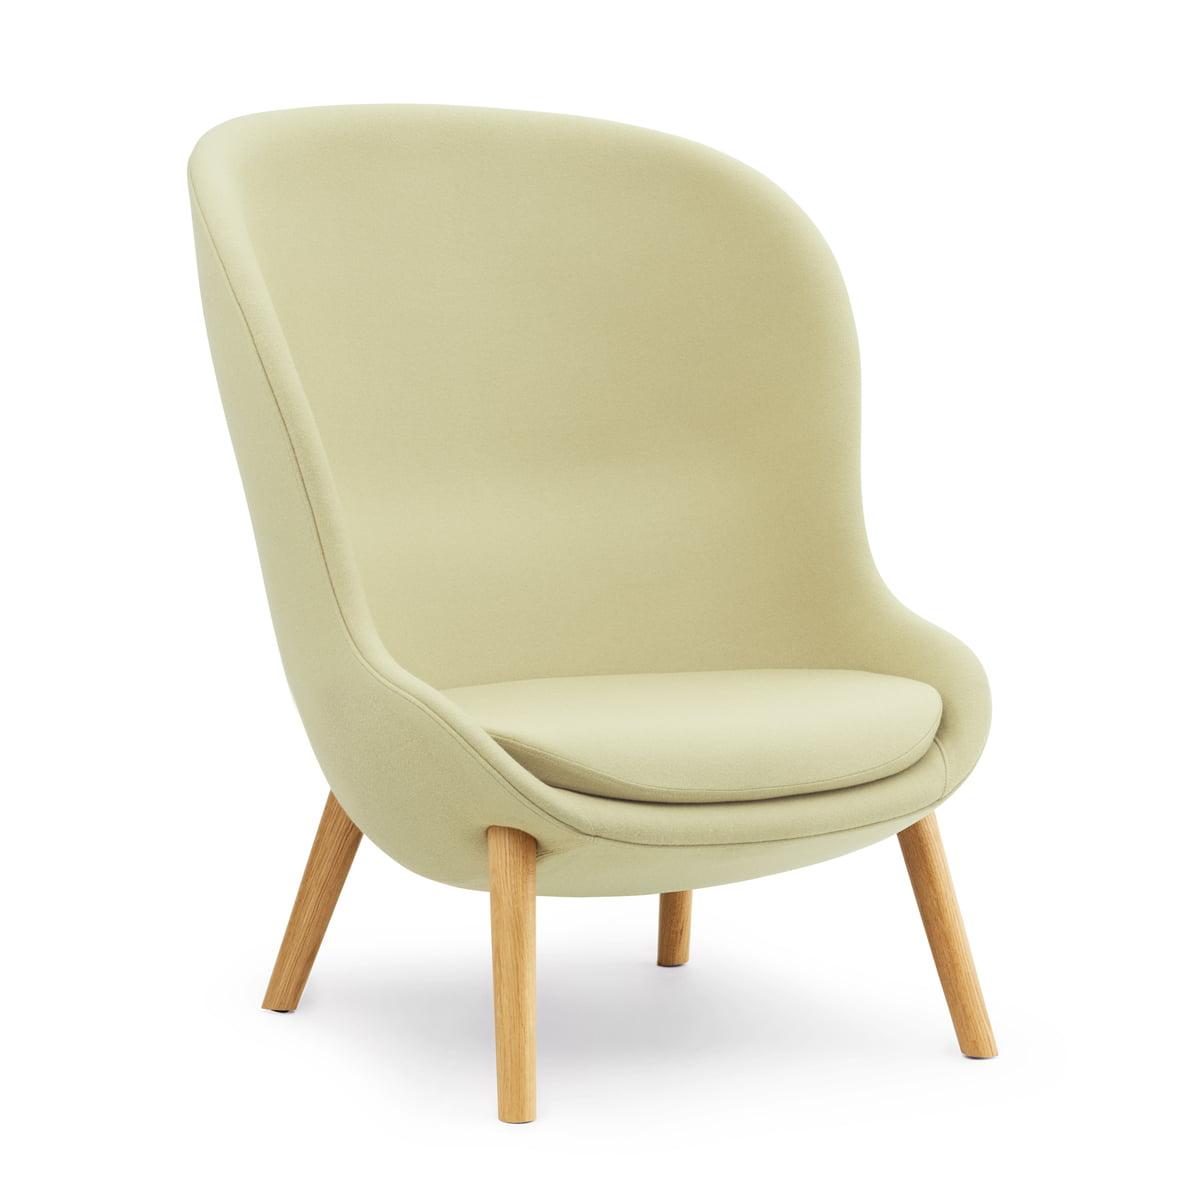 Normann Copenhagen - Hyg Lounge Chair High, Eiche / grün (Synergy LDS23)   Wohnzimmer > Sessel > Loungesessel   Grün   Normann Copenhagen